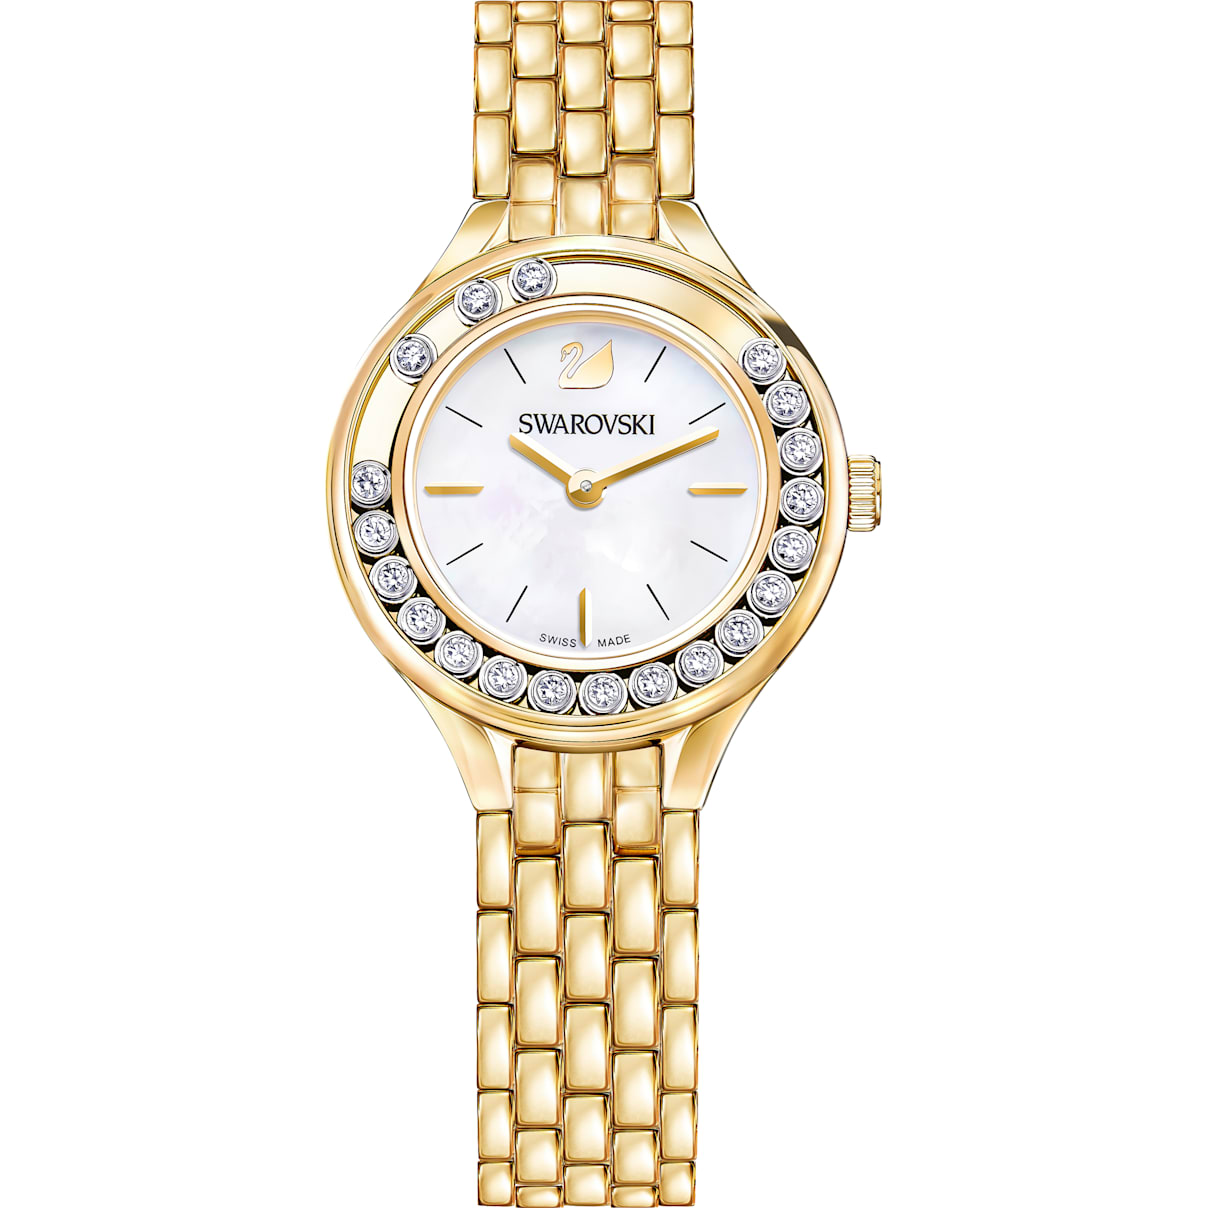 Swarovski Lovely Crystals Watch, Metal bracelet, Gold-tone PVD